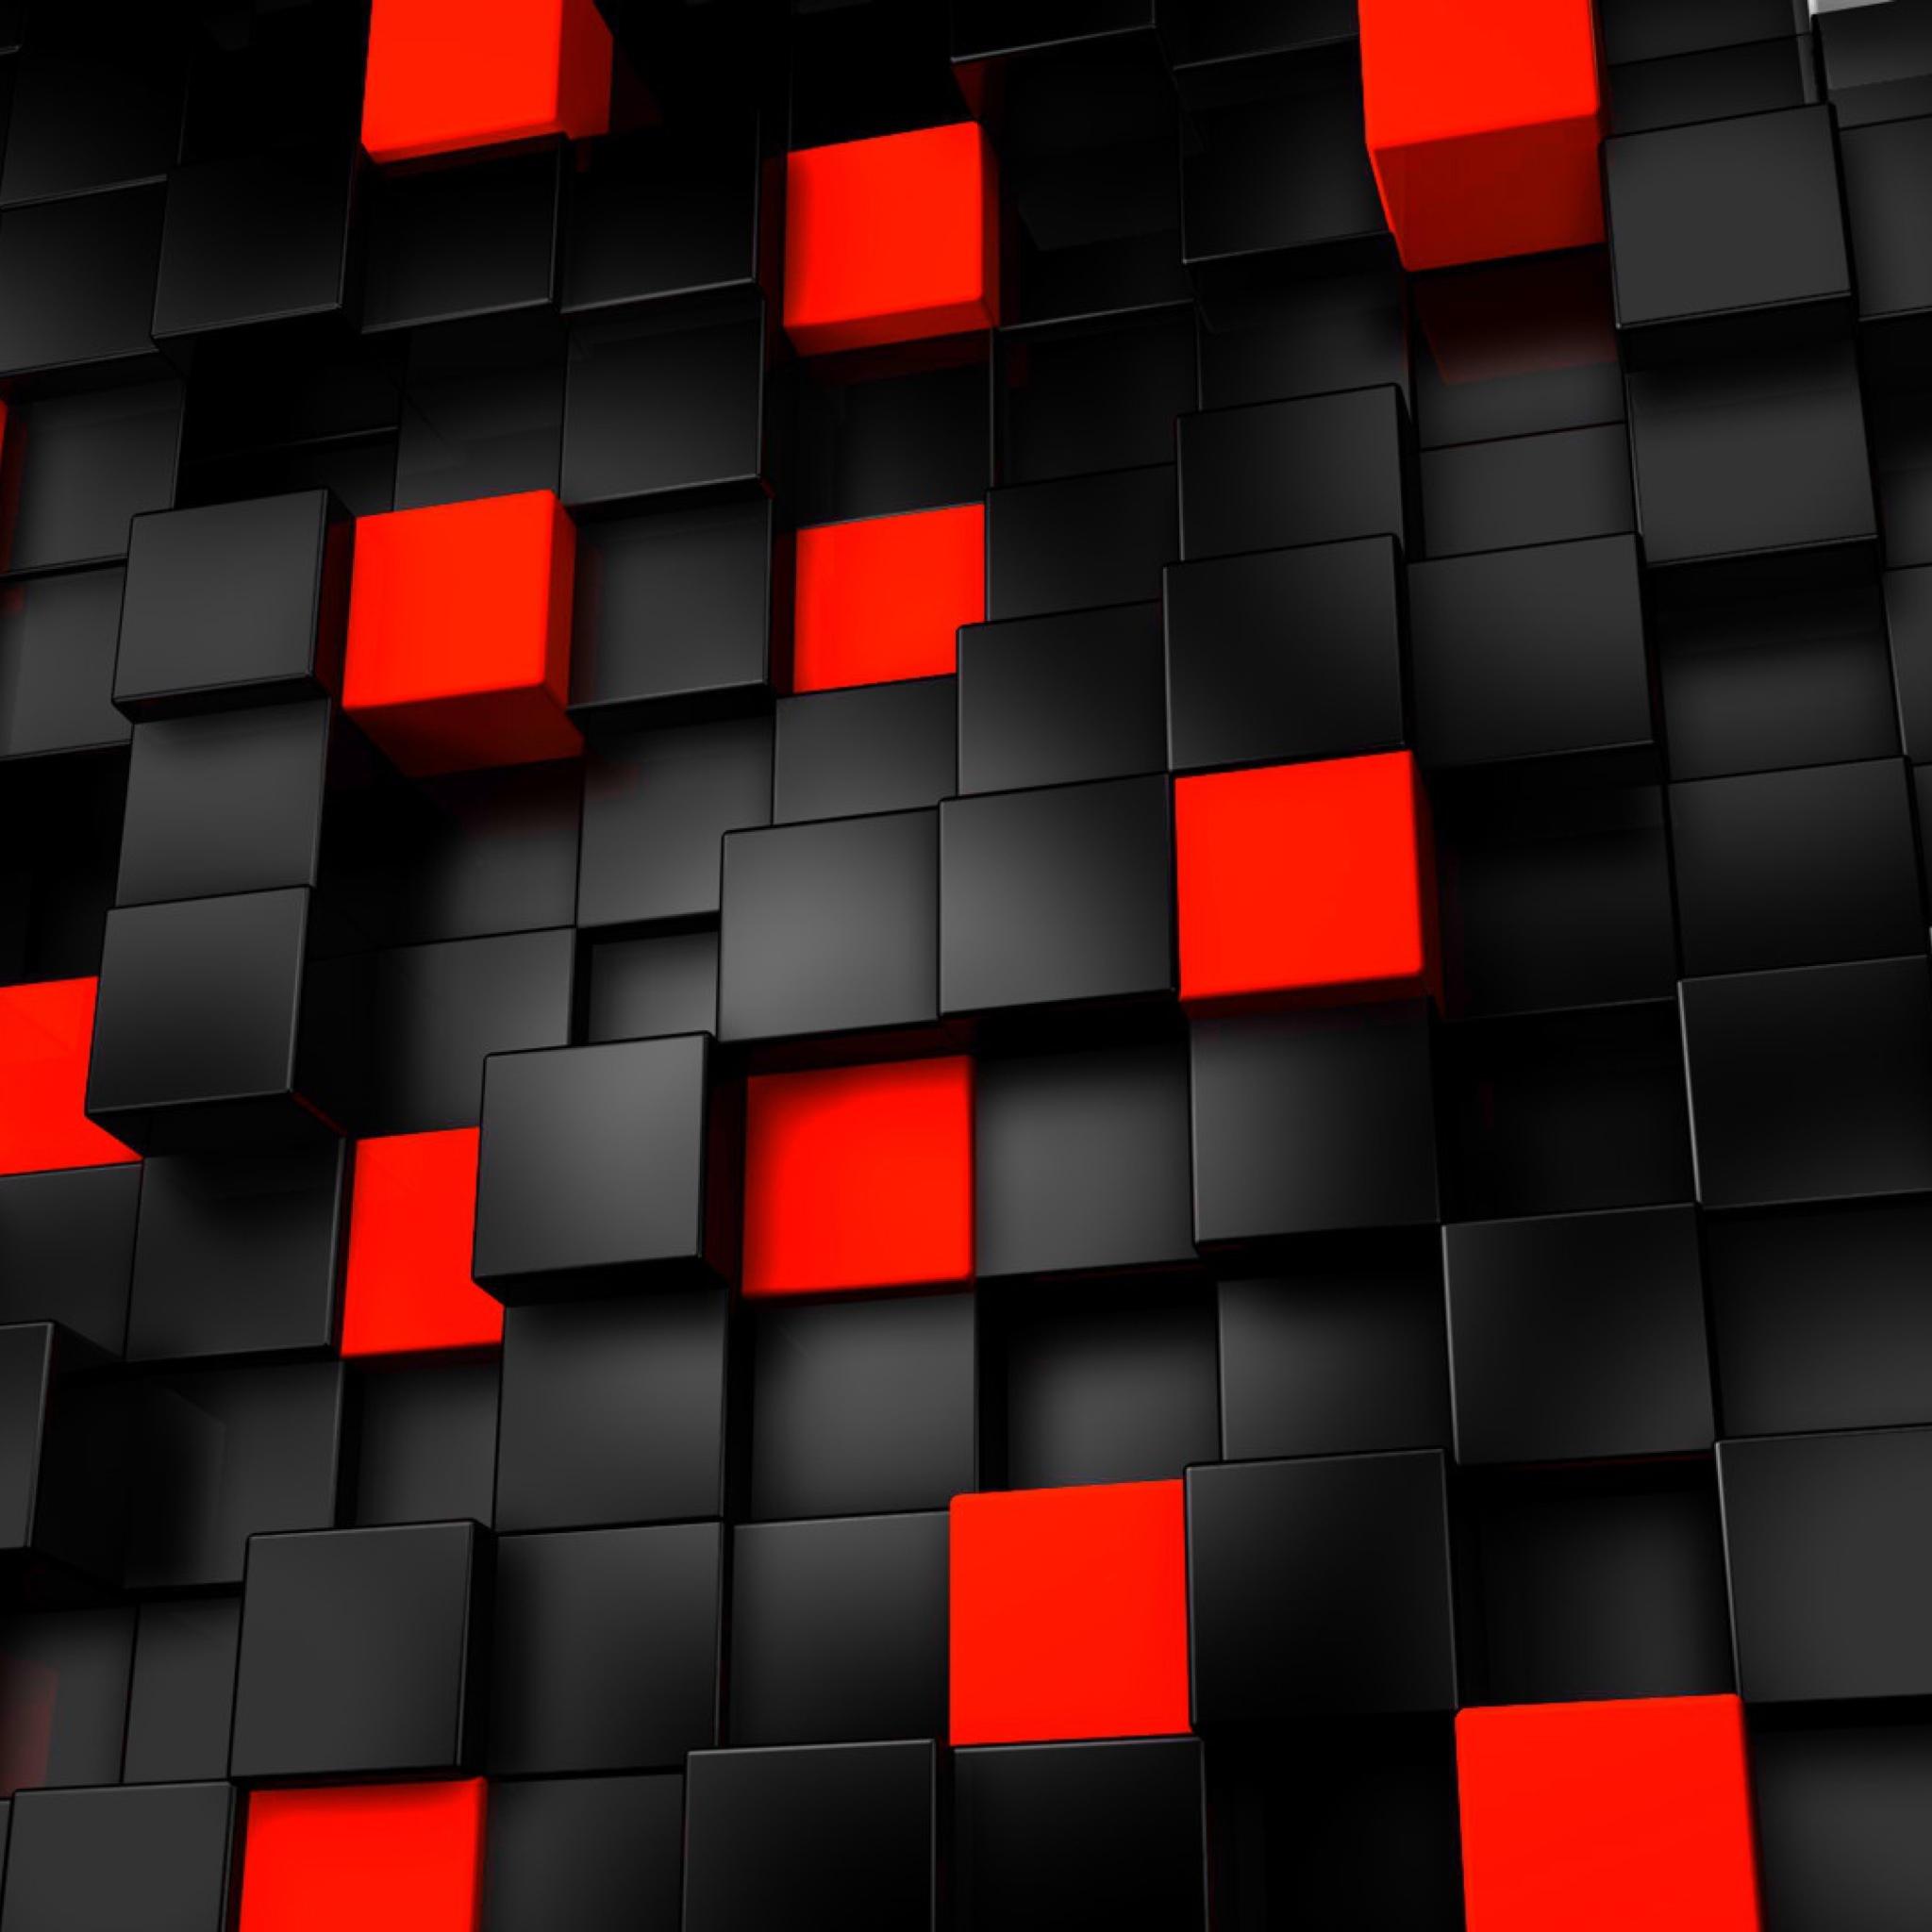 Кубики  № 2315727 без смс